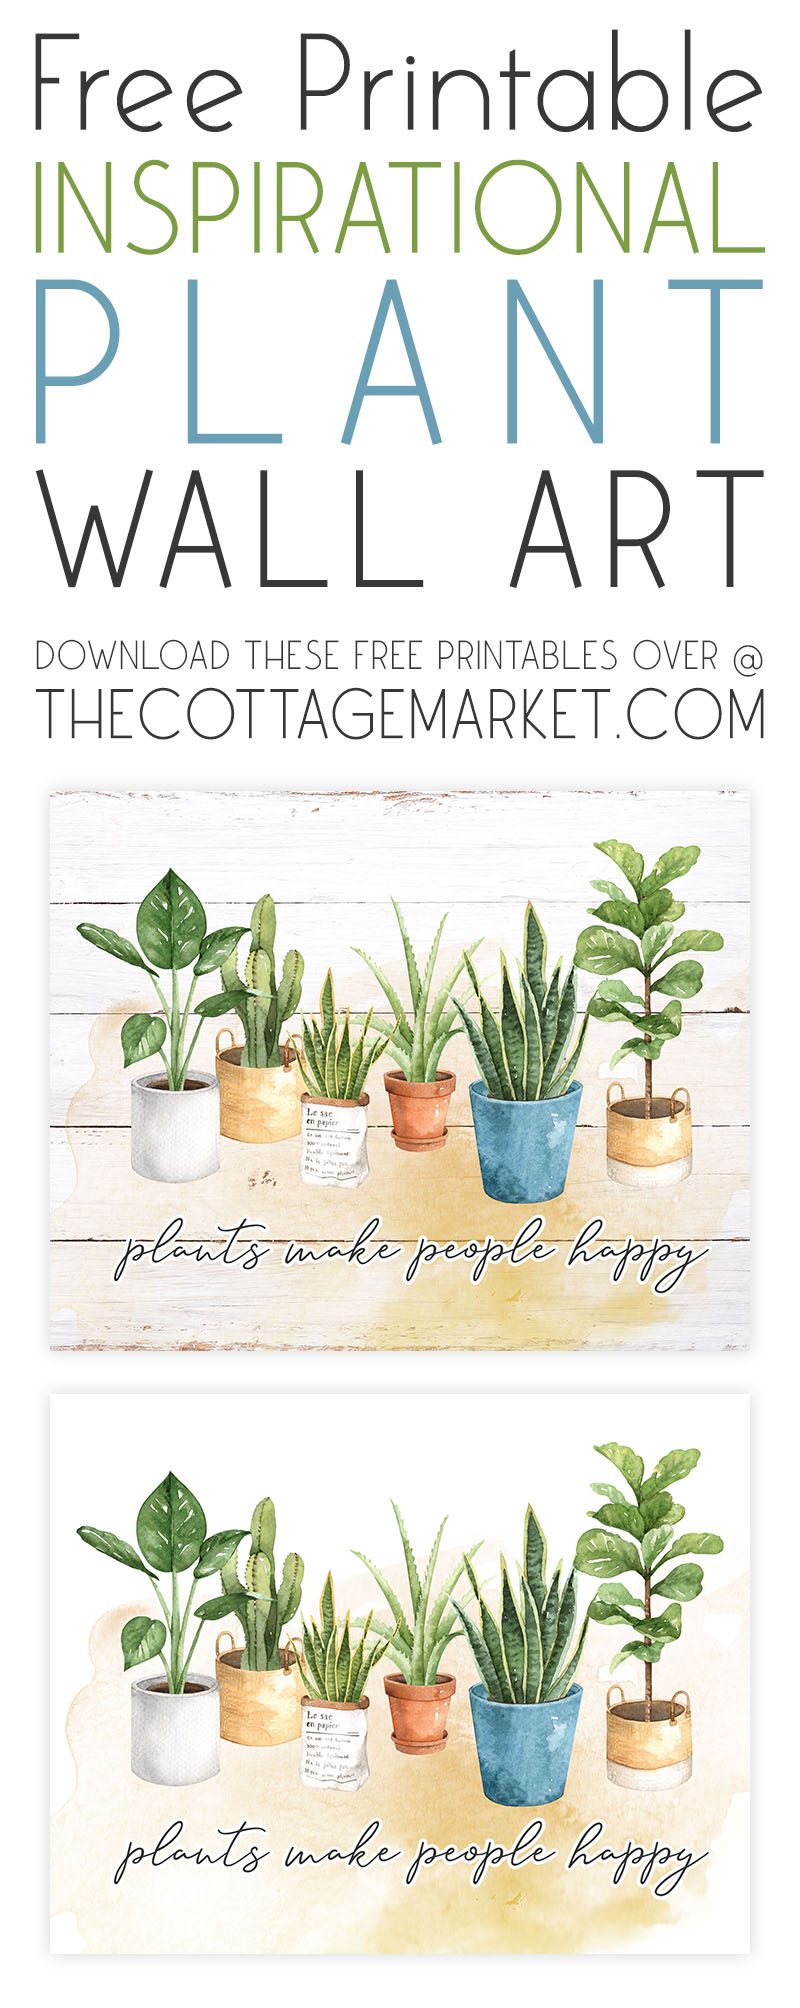 https://thecottagemarket.com/wp-content/uploads/2021/01/tcm-plants-T-1.jpg